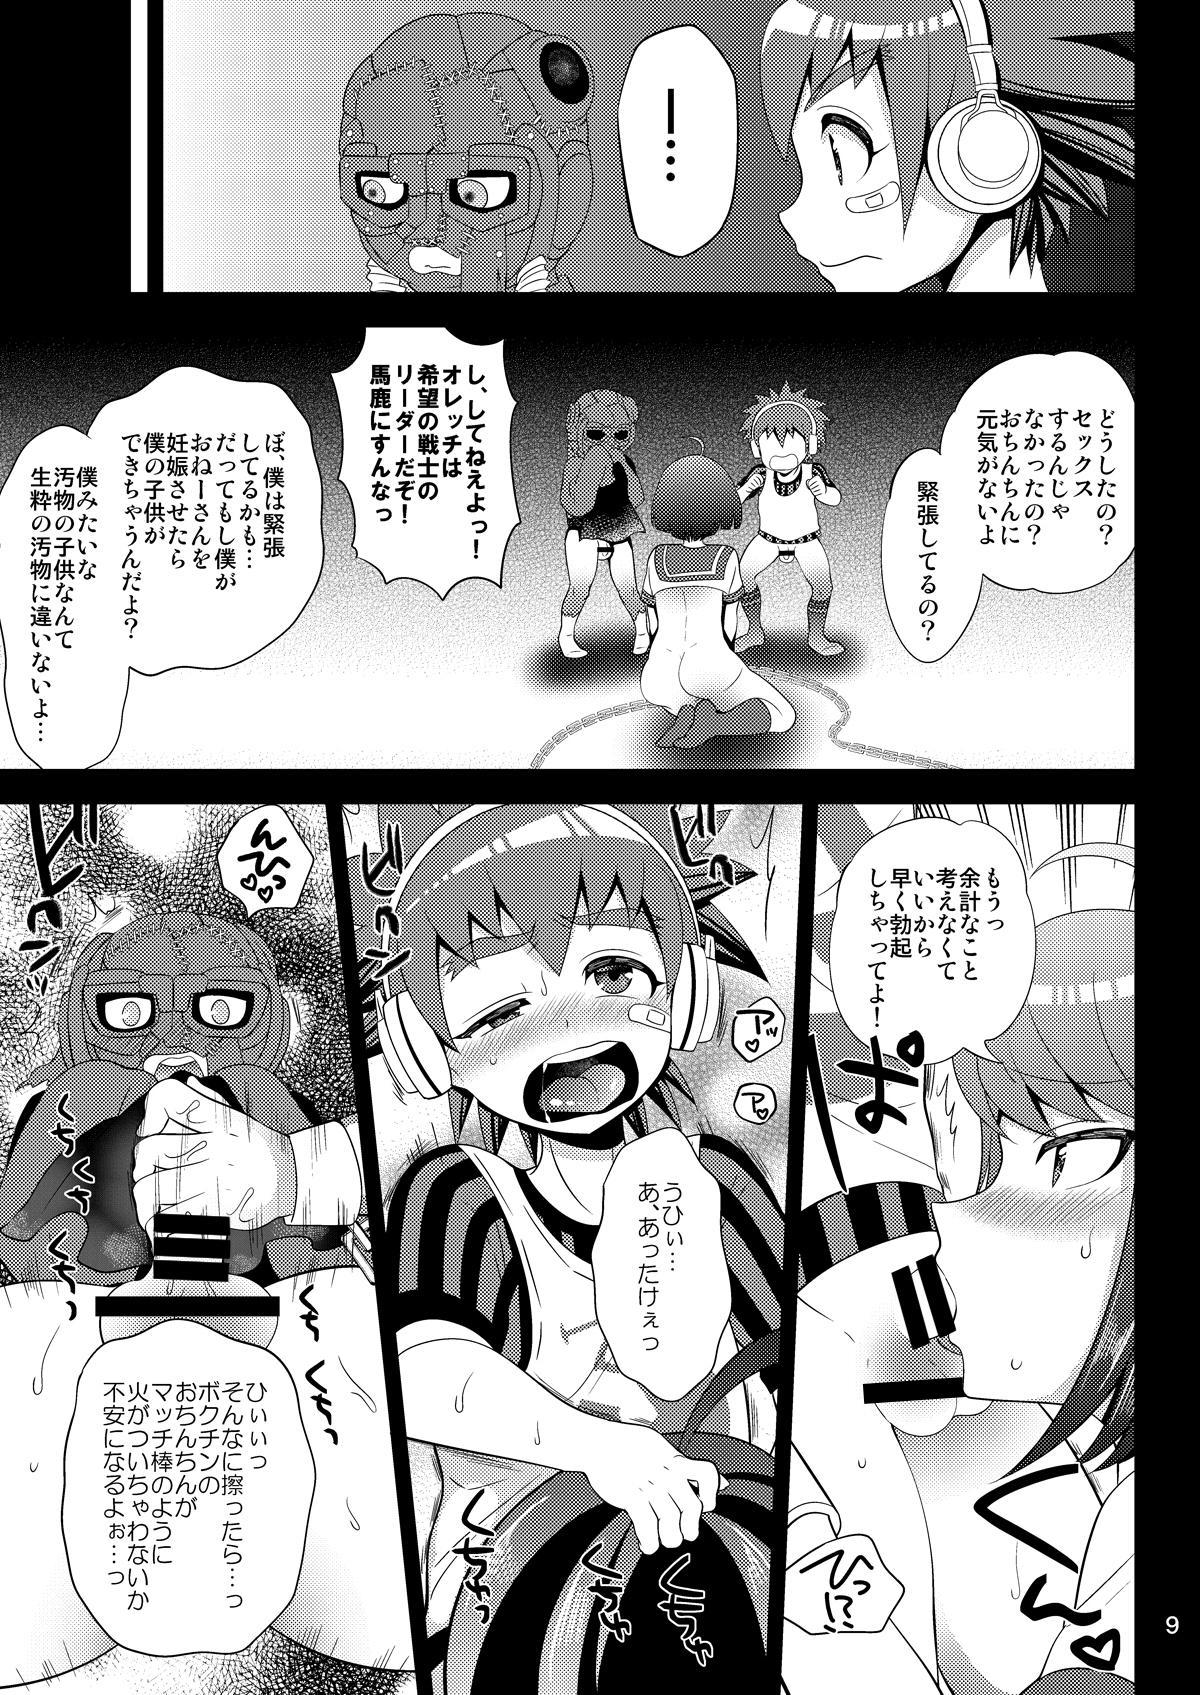 Kibou no Idenshi 8